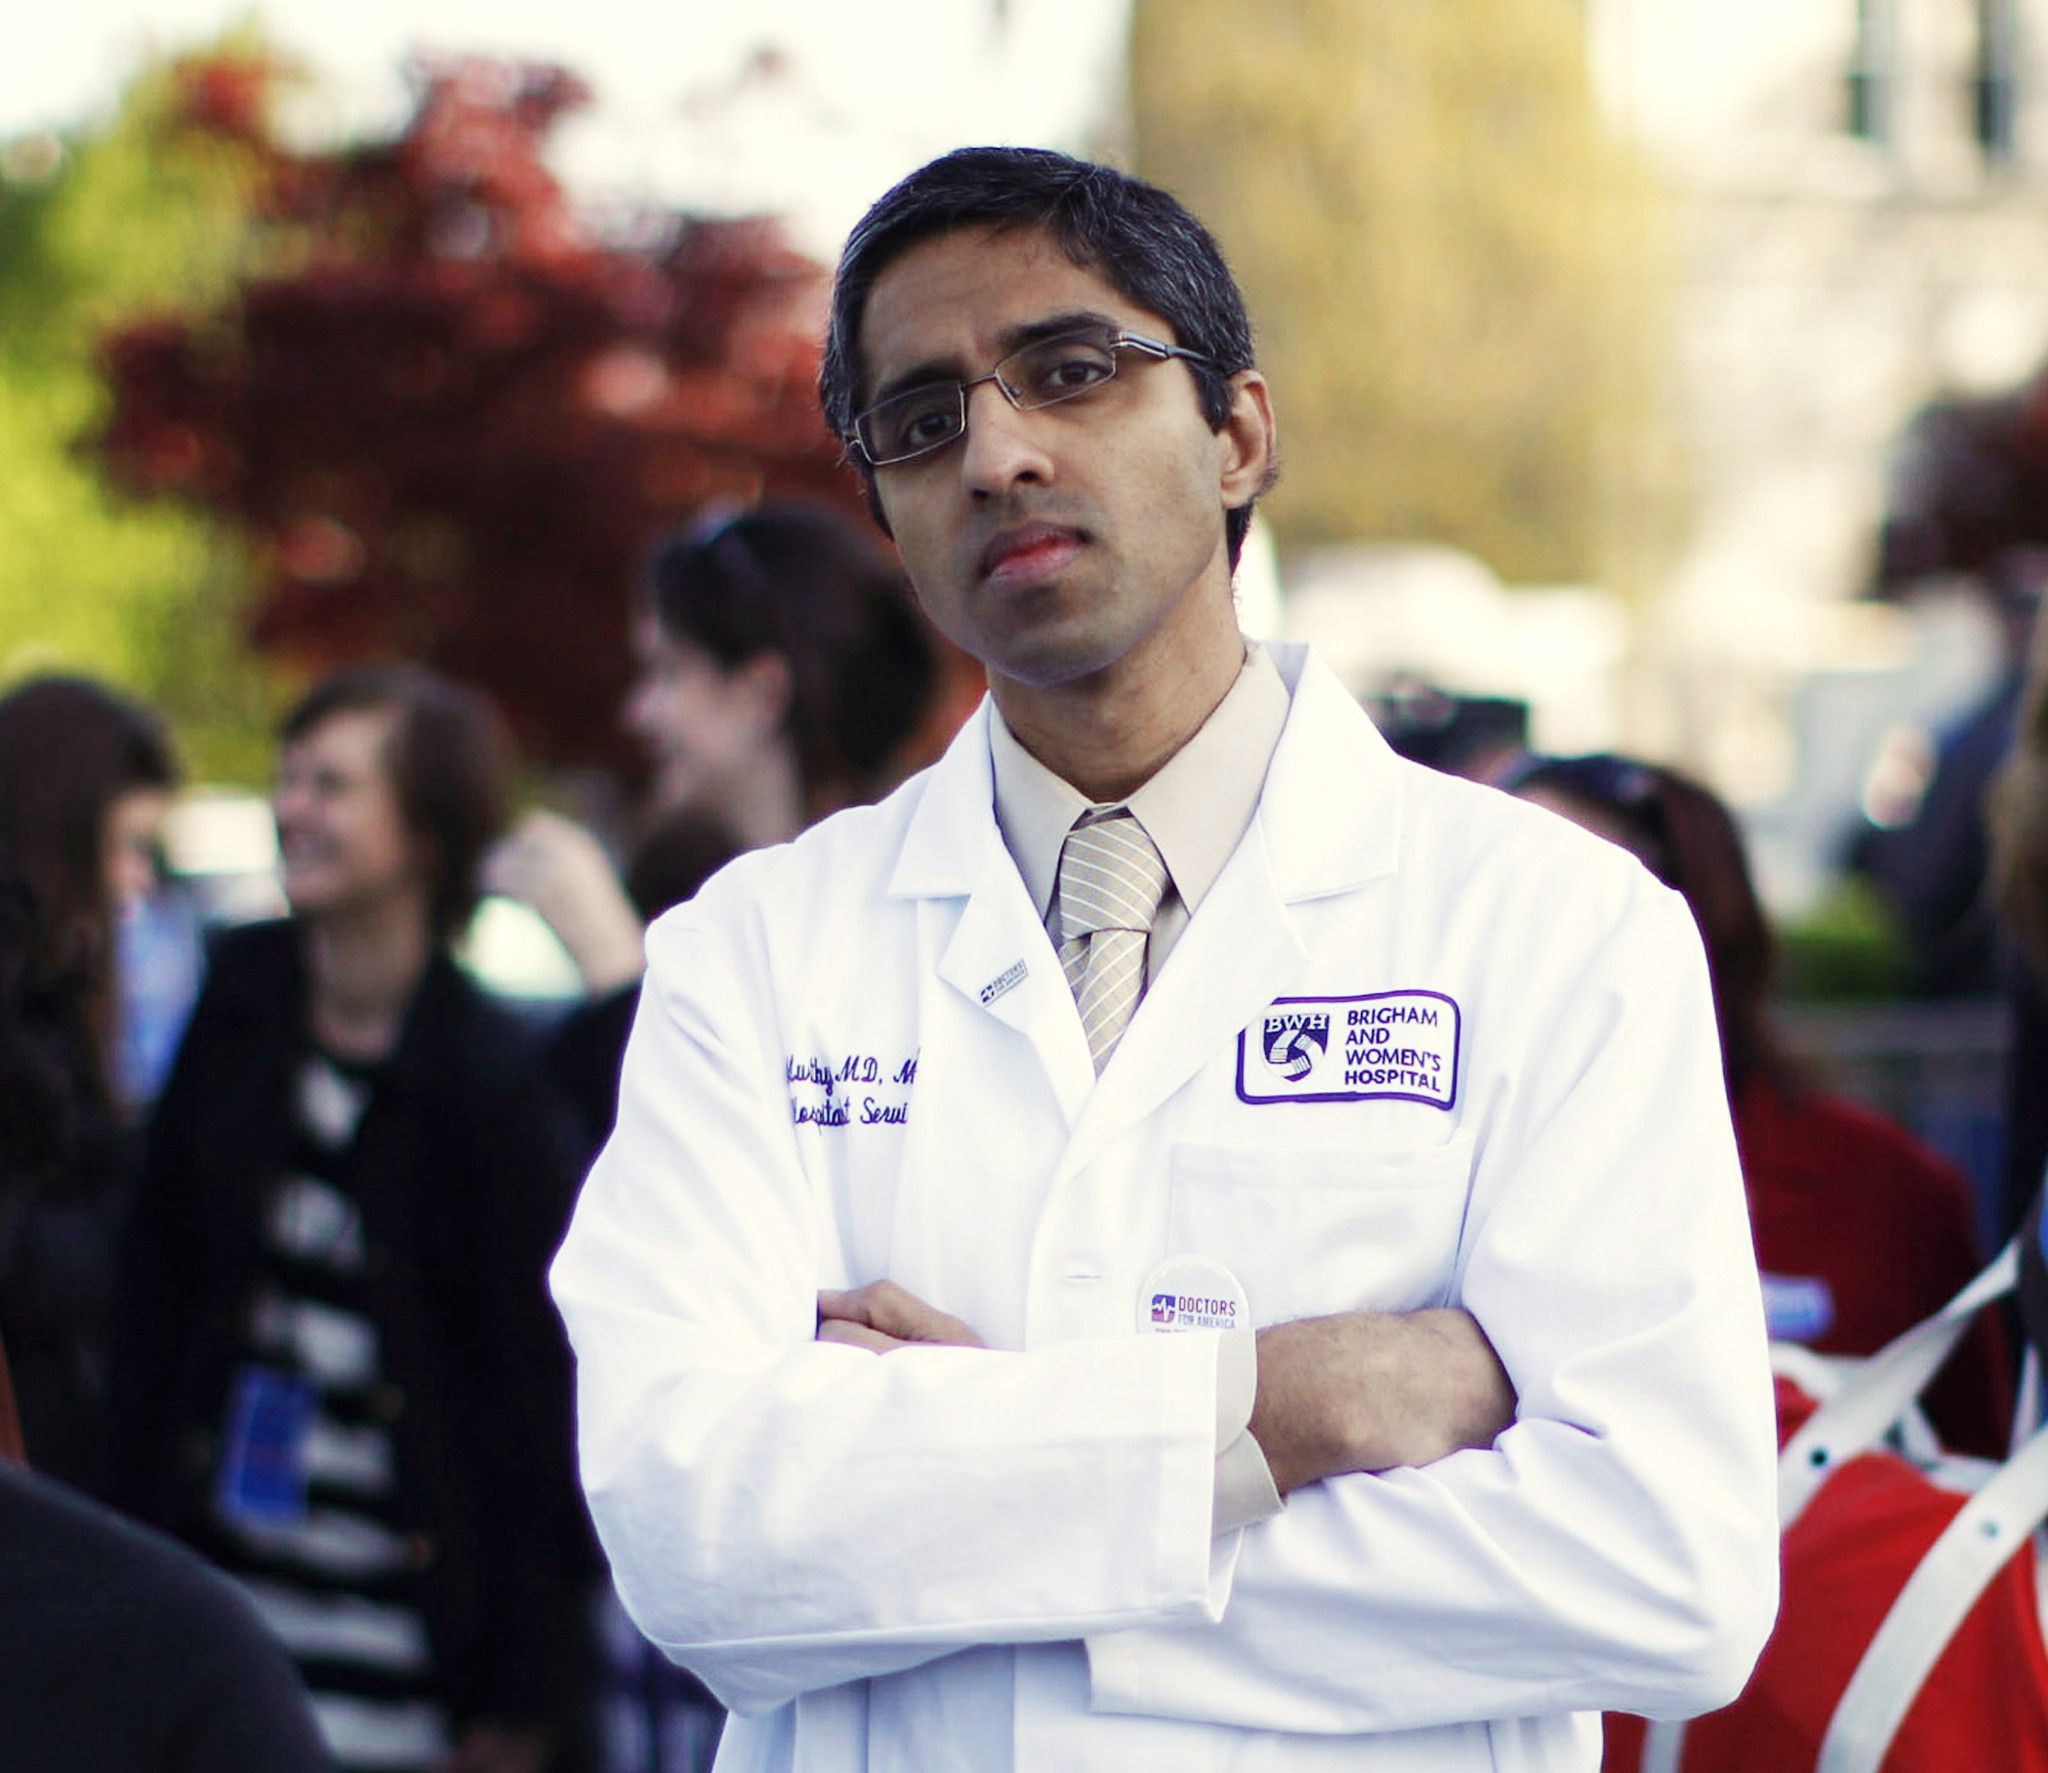 Senate approves new surgeon general Vivek murthy, Obama